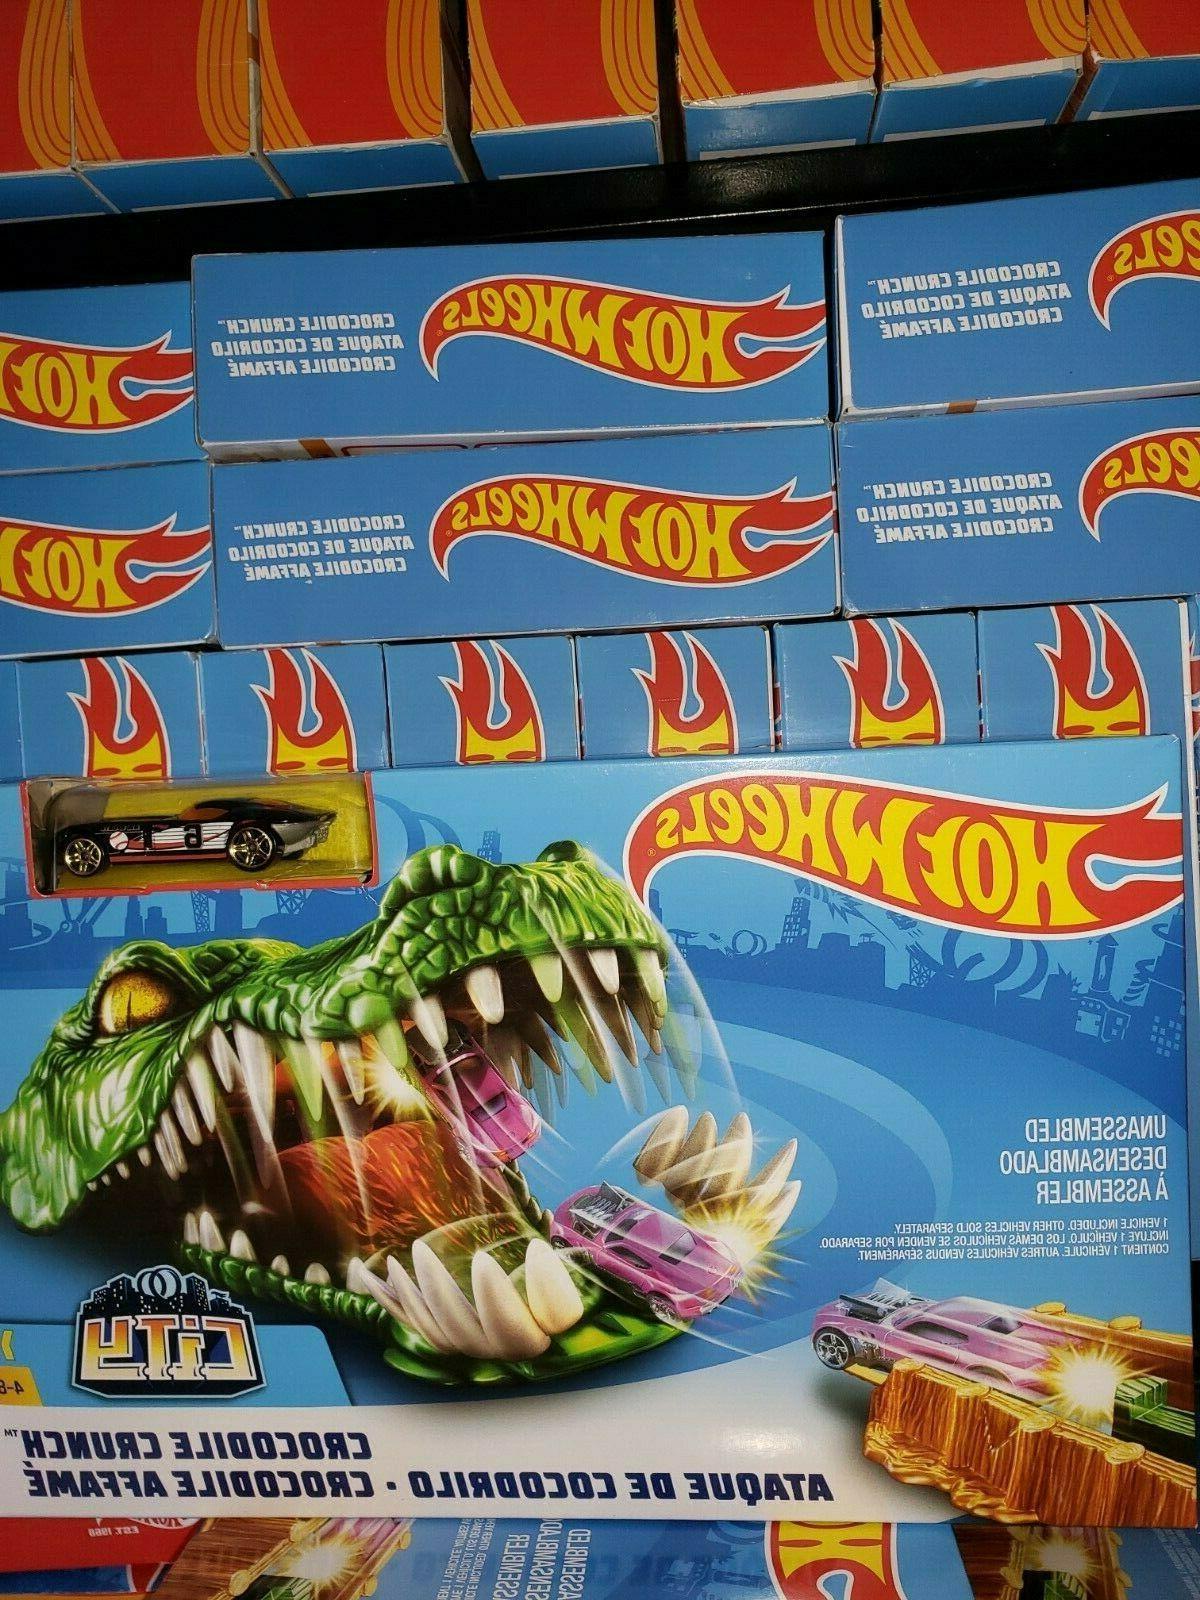 crocodile crunch car and track play set